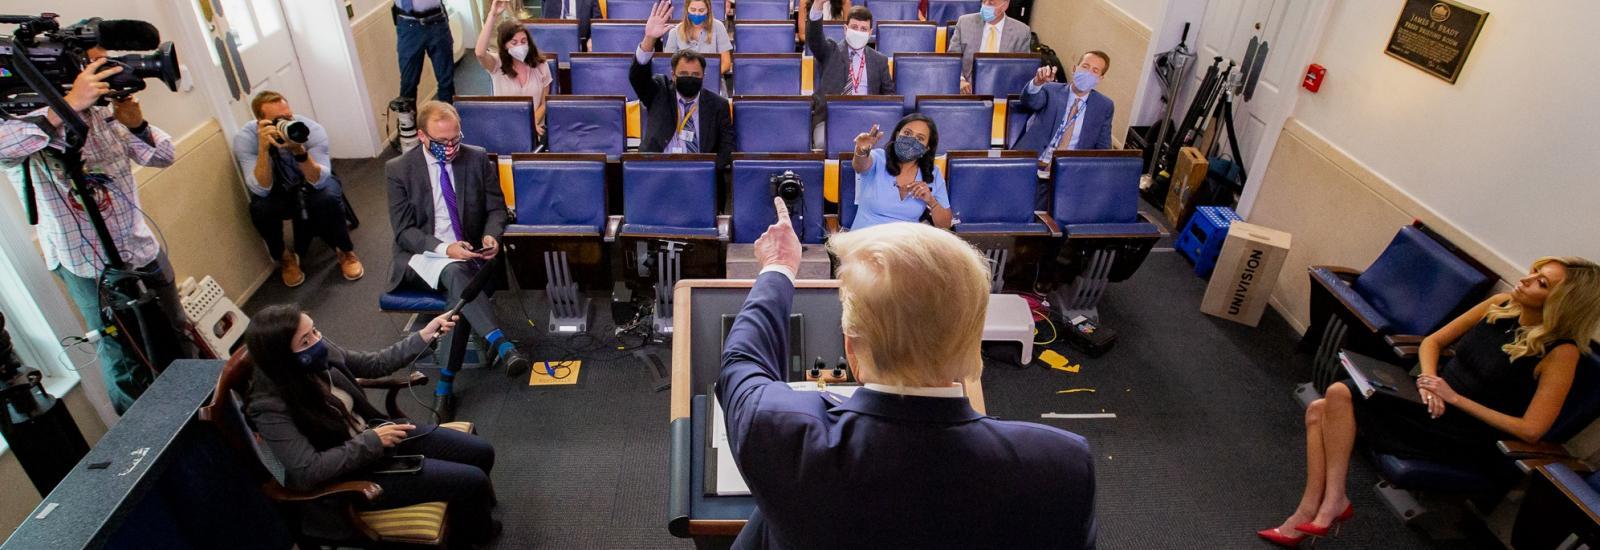 © Official White House Photo by Shealah Craighead